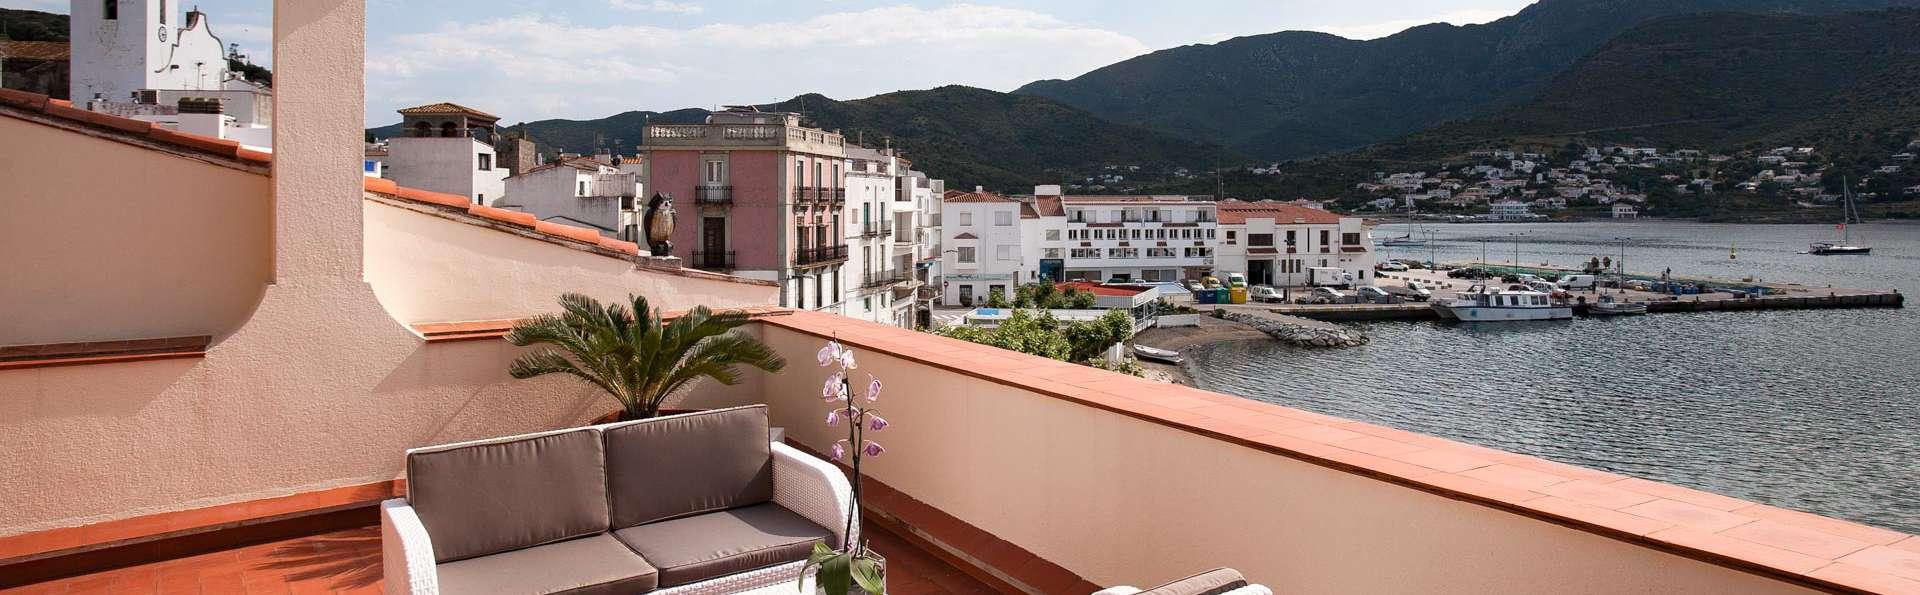 Hotel Mar d'Amunt - EDIT_TERRACE_02.jpg